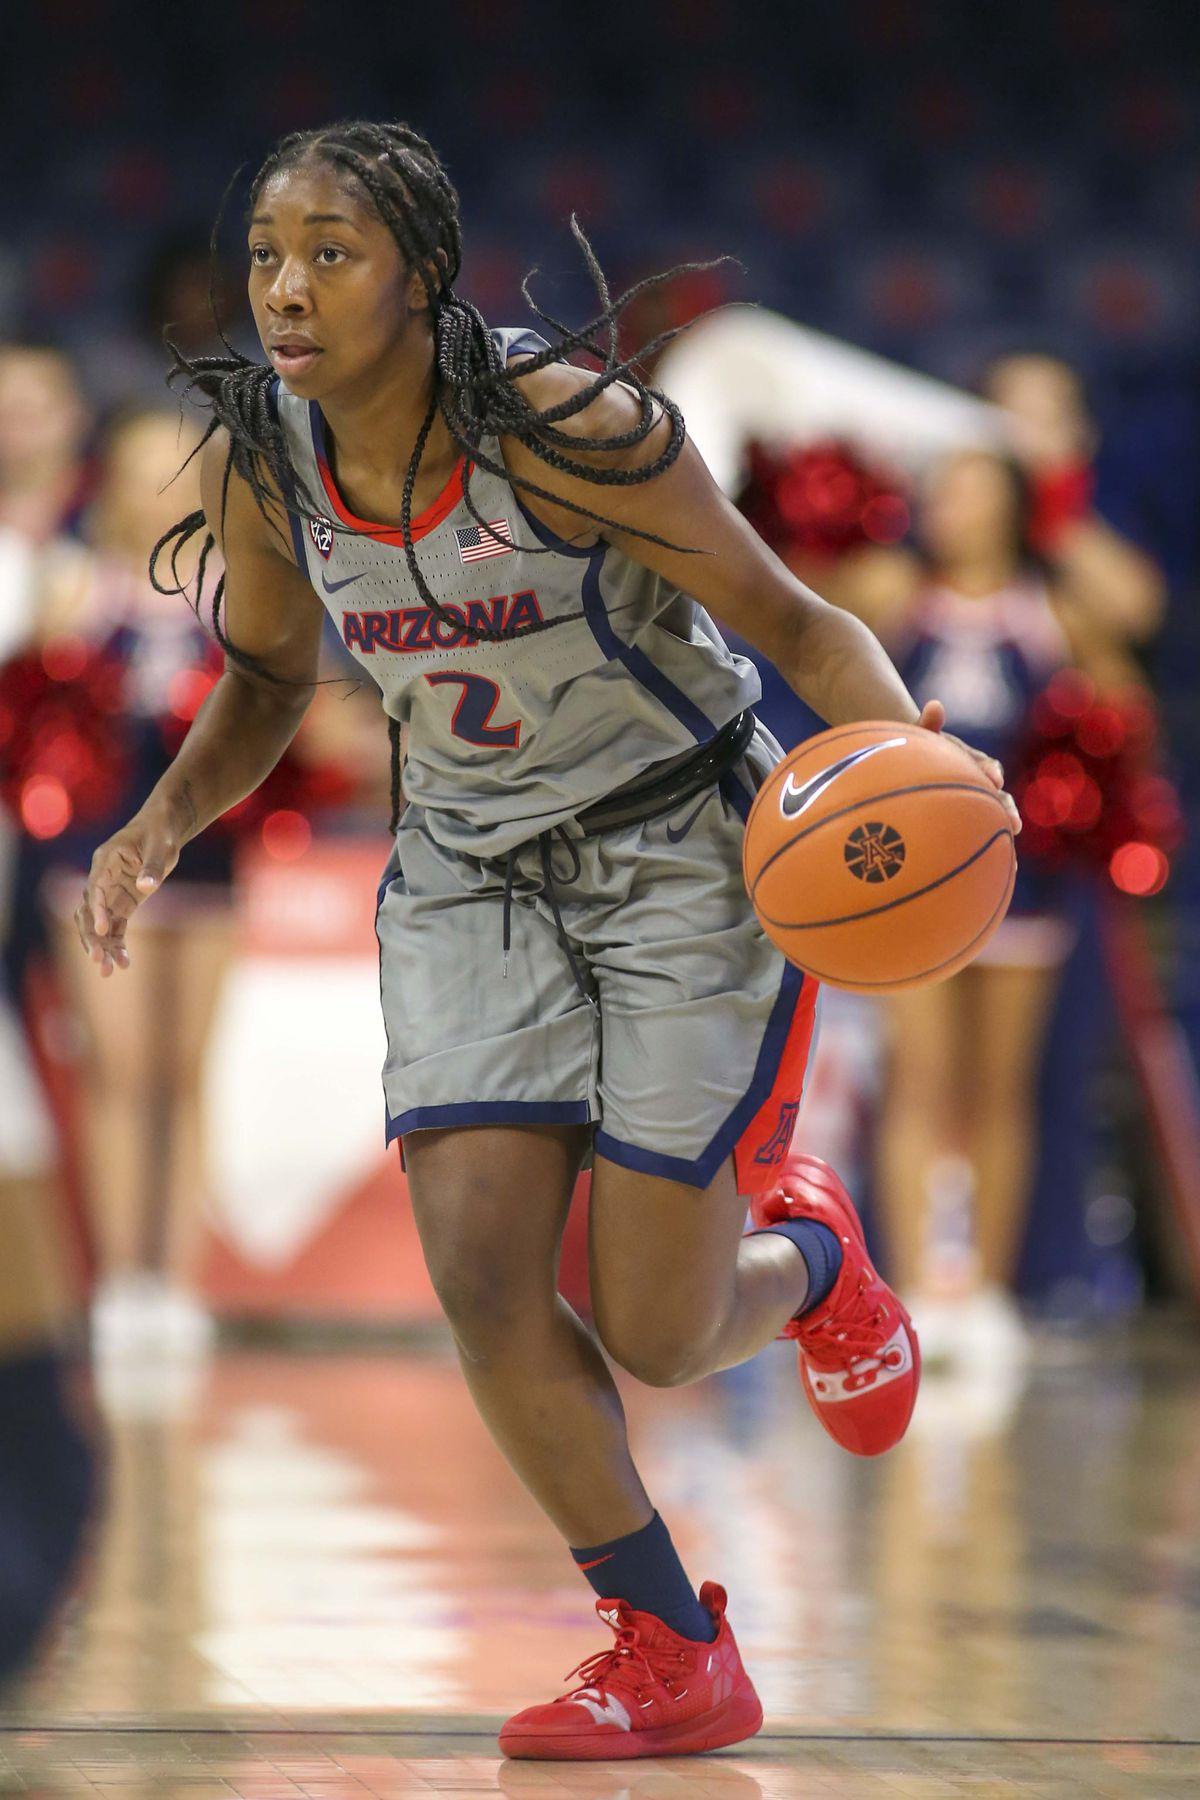 COLLEGE BASKETBALL: NOV 13 Women's - Loyola Marymount at Arizona